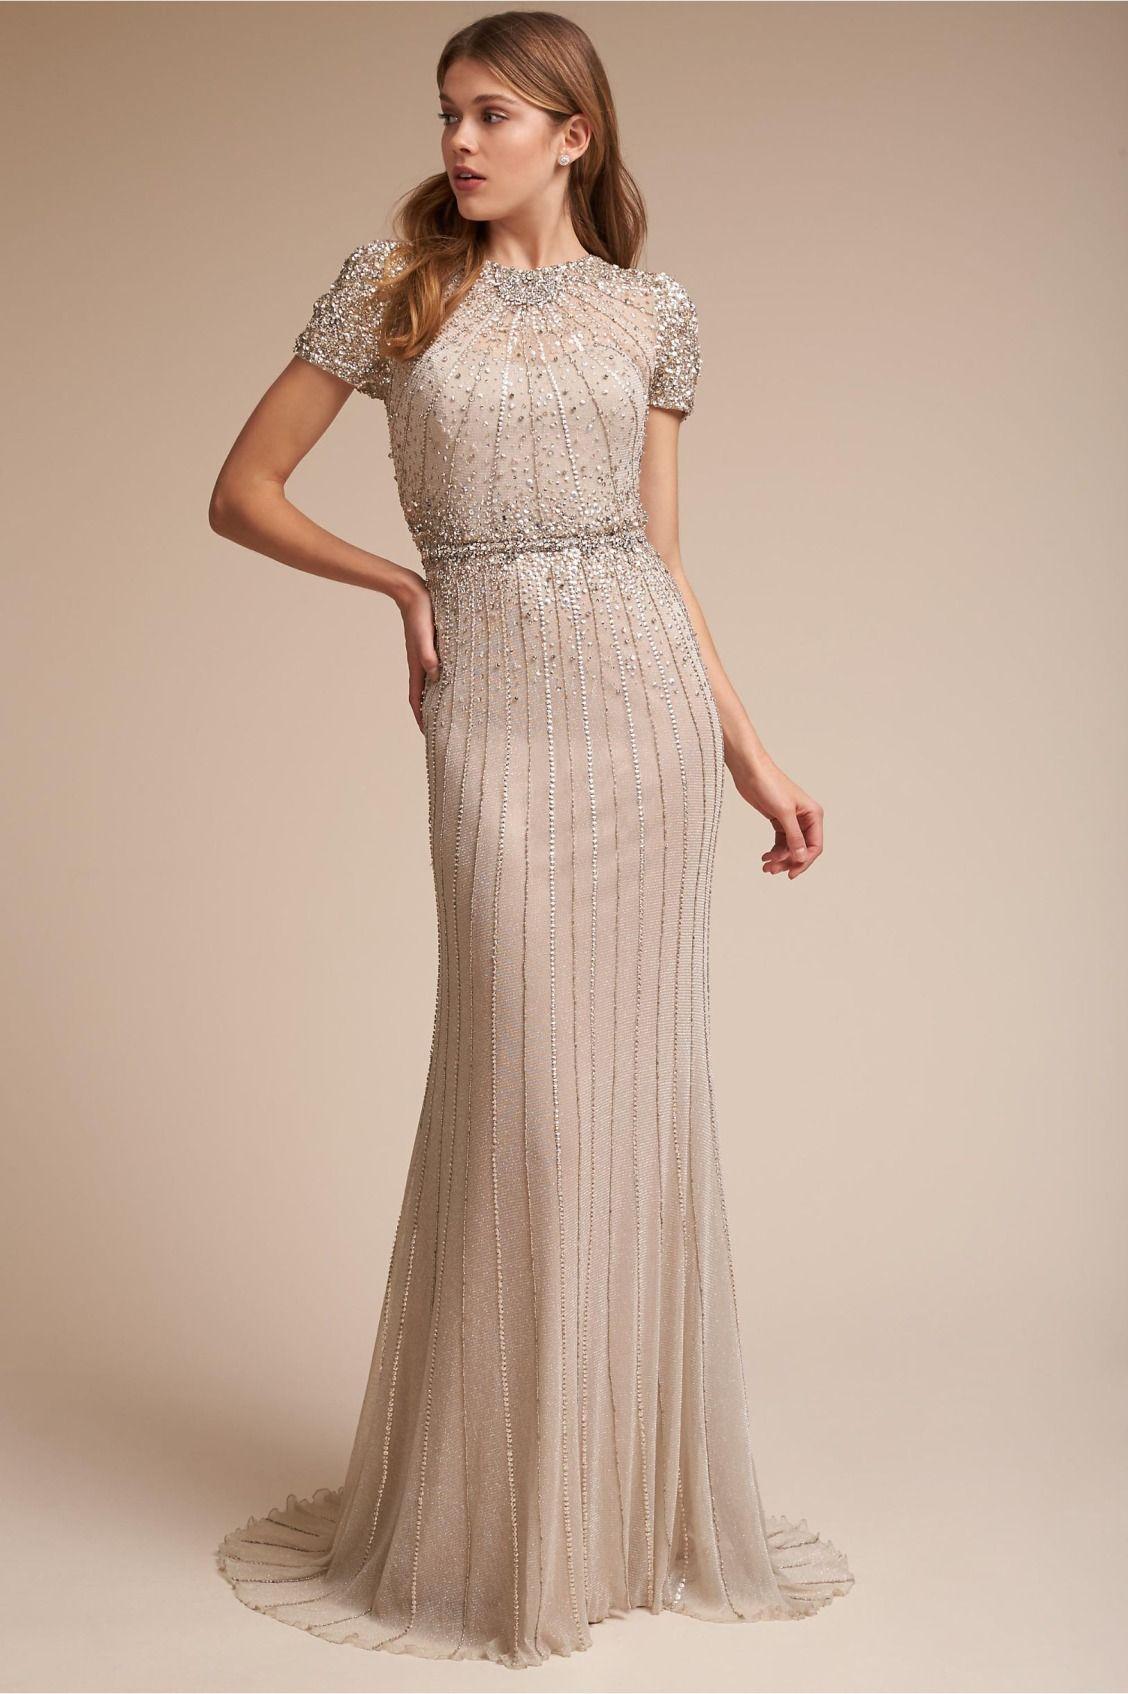 Glamorous Column Dress Barton Gown From Bhldn Wedding Dress Sizes Casual Wedding Dress Vintage Inspired Wedding Dresses [ 1694 x 1128 Pixel ]